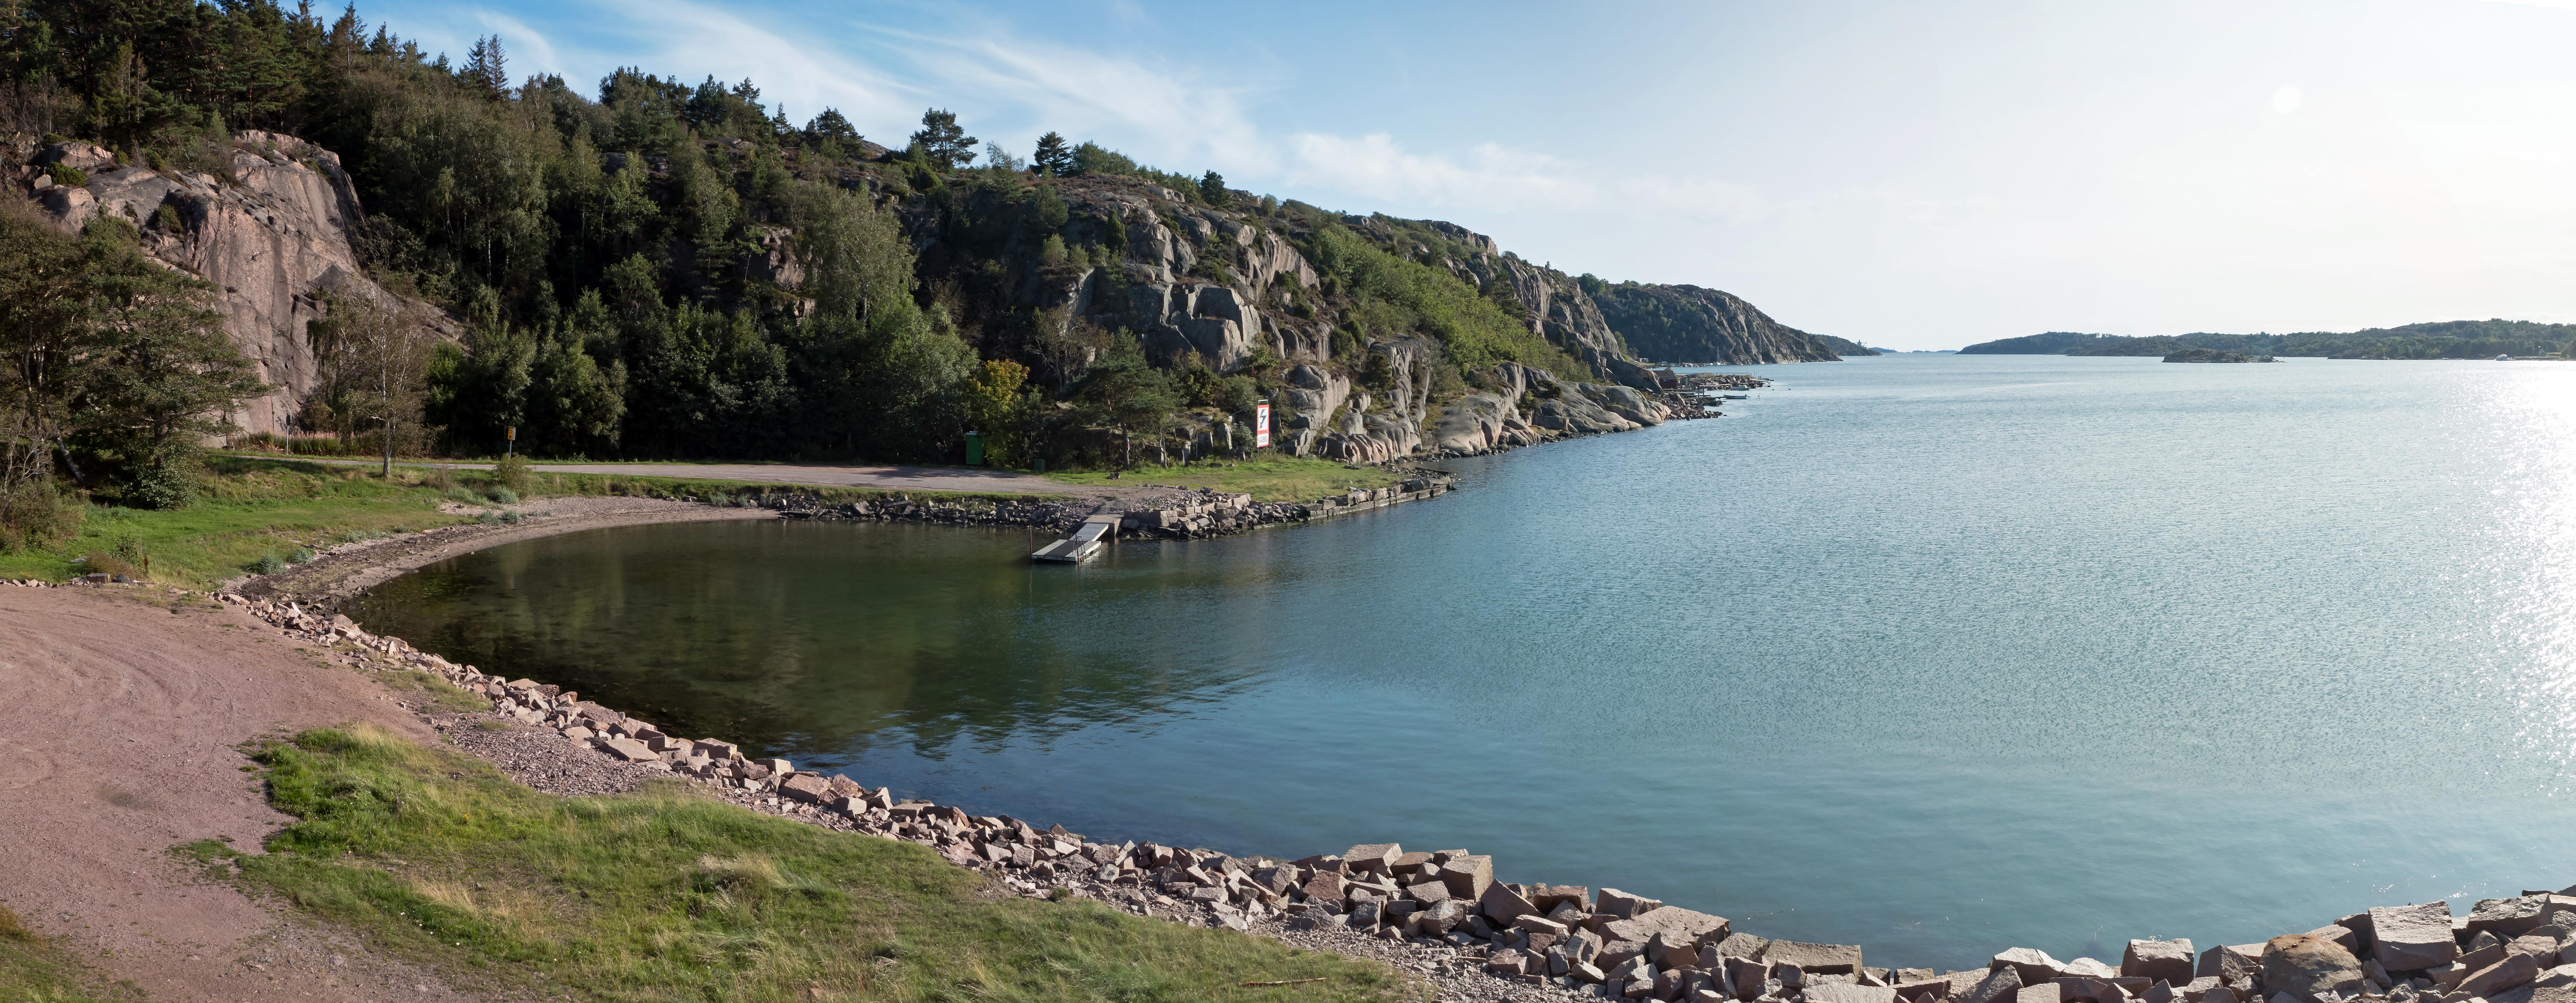 Sandvik in brofjorden photo